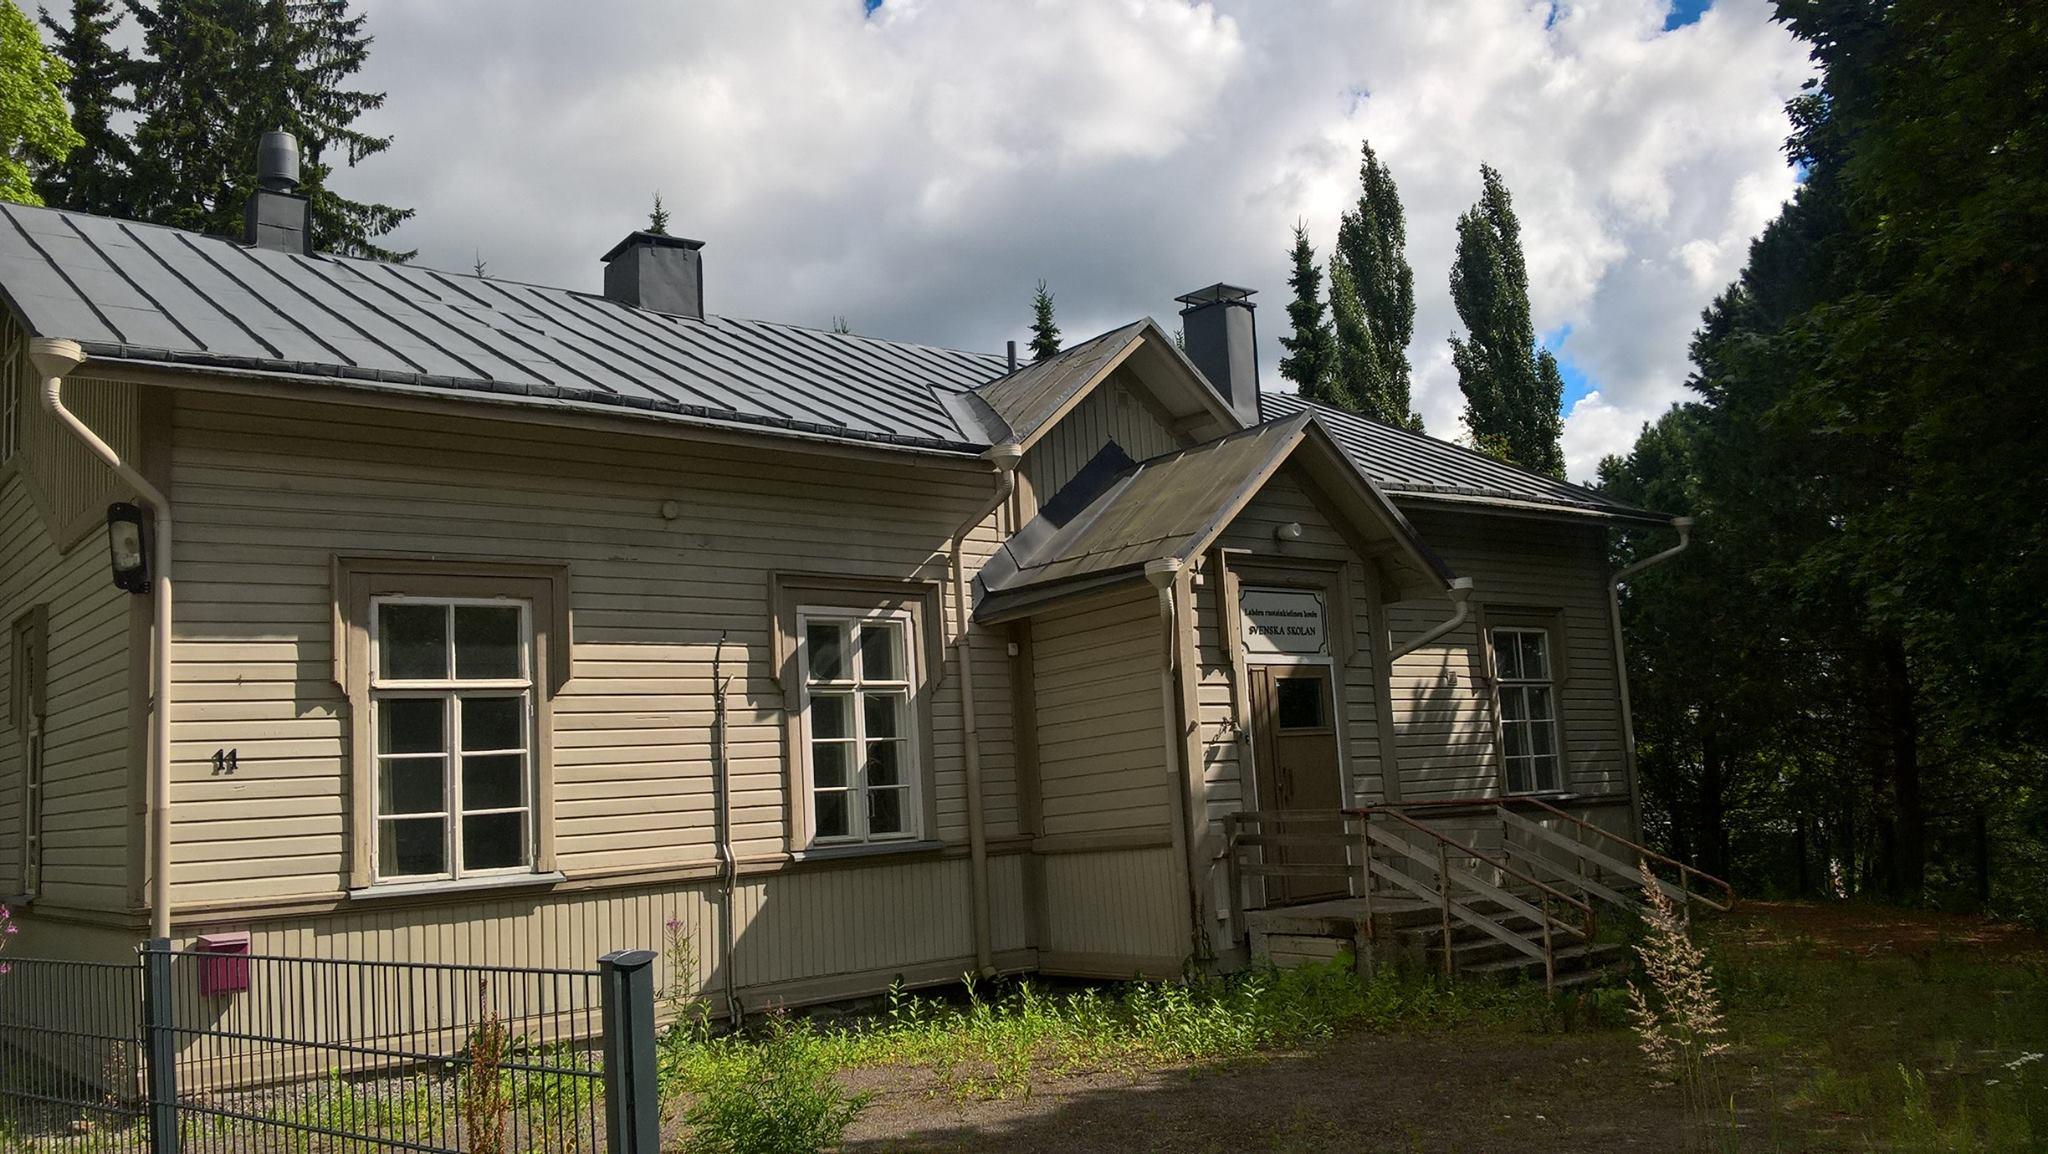 Lahtis svenska skola